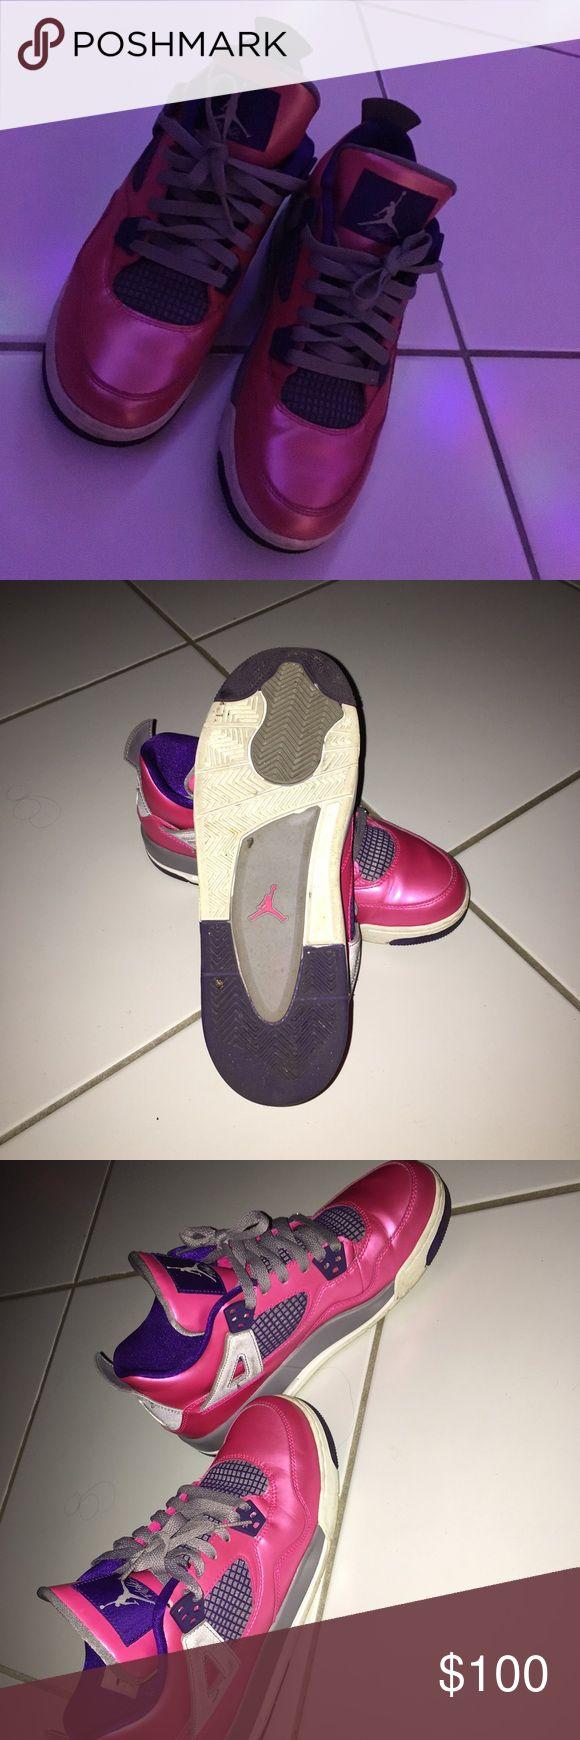 Air Jordan 4 Retro GS - Pink/Purple-Grey Original air Jordan's Worn 2-3 times since purchased Jordan Shoes